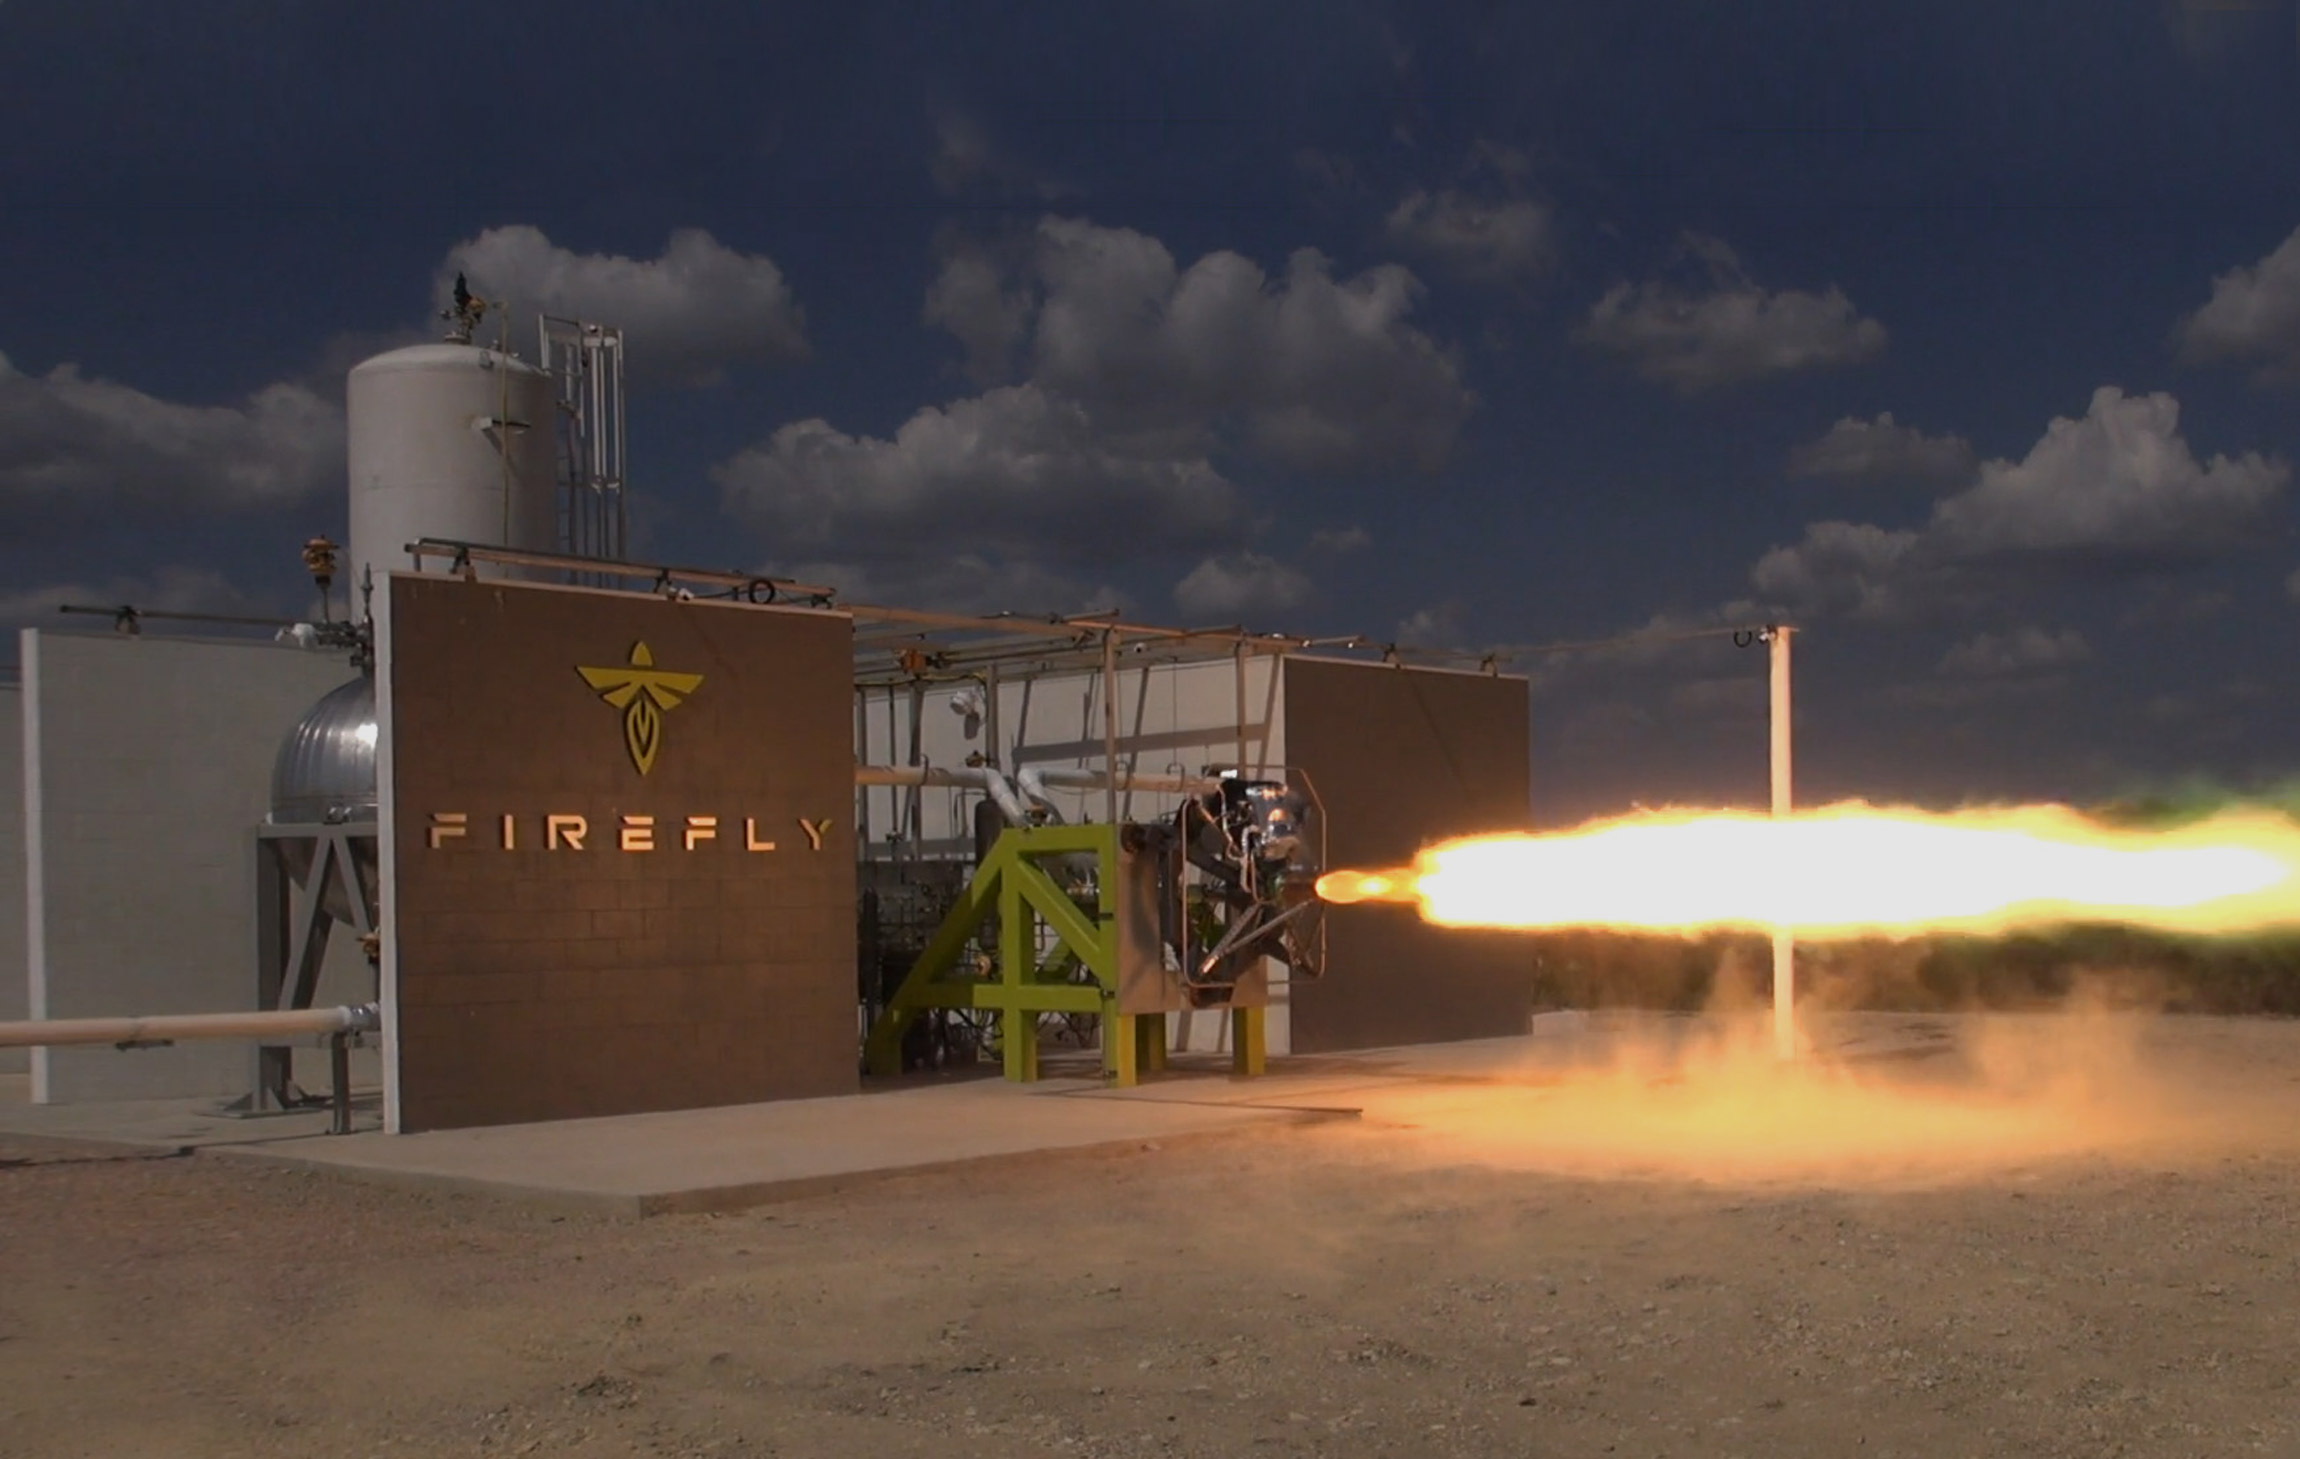 The first Firefly engine test. Image via Firefly Aerospace.